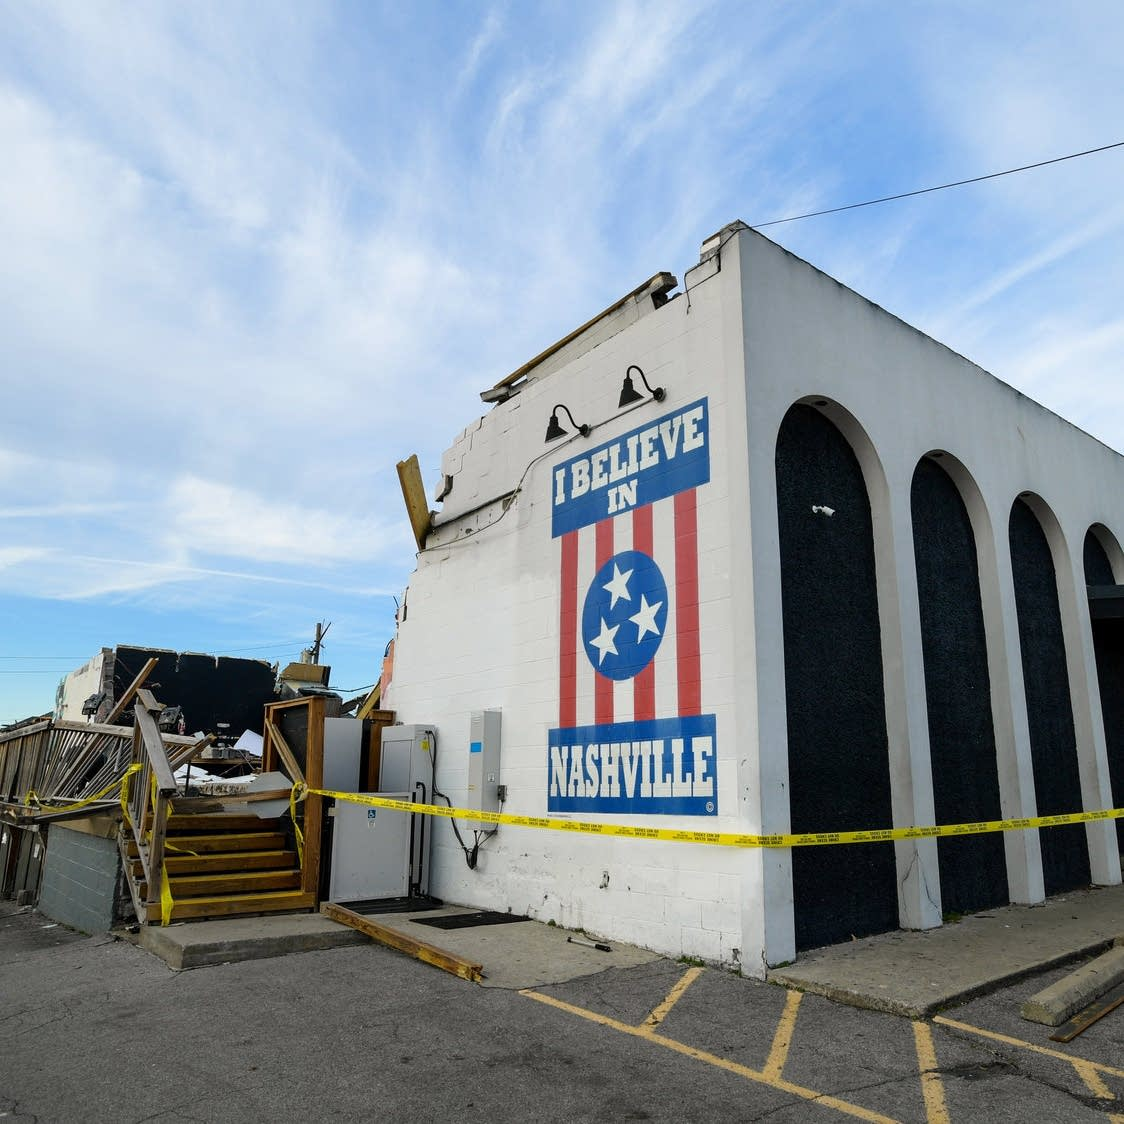 Destroyed exterior of The Basement East music venue in Nashville